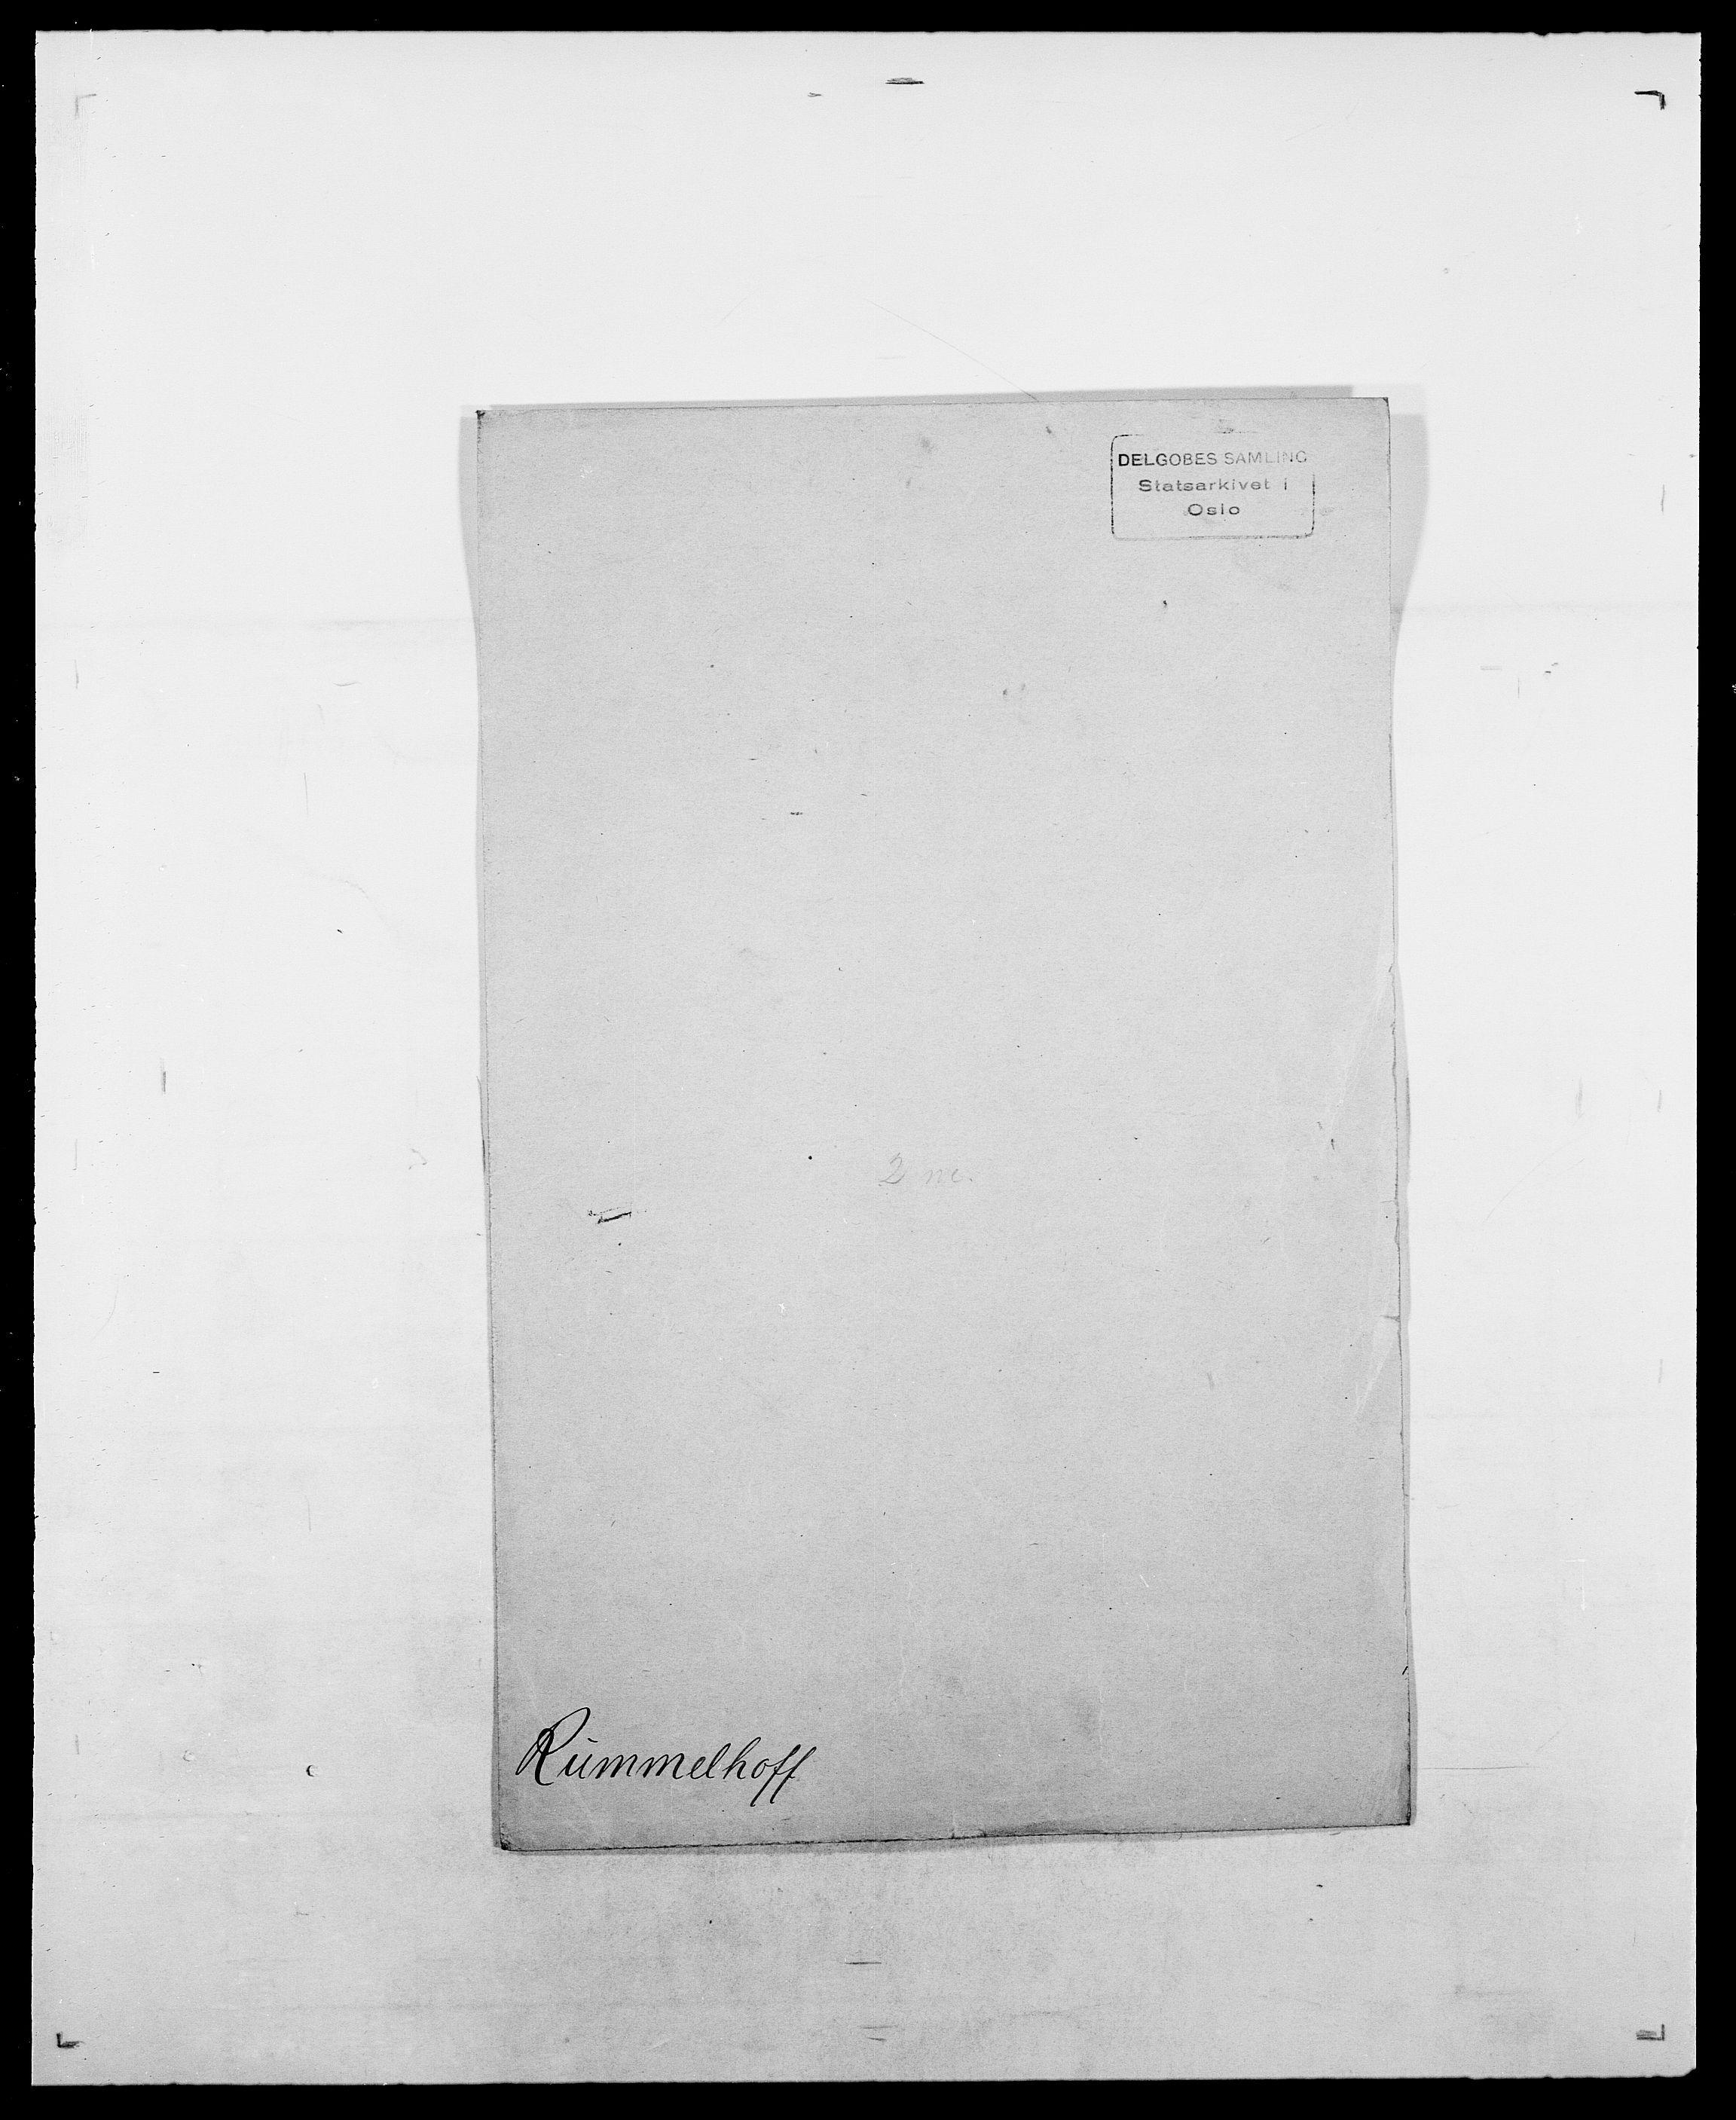 SAO, Delgobe, Charles Antoine - samling, D/Da/L0033: Roald - Røyem, s. 459